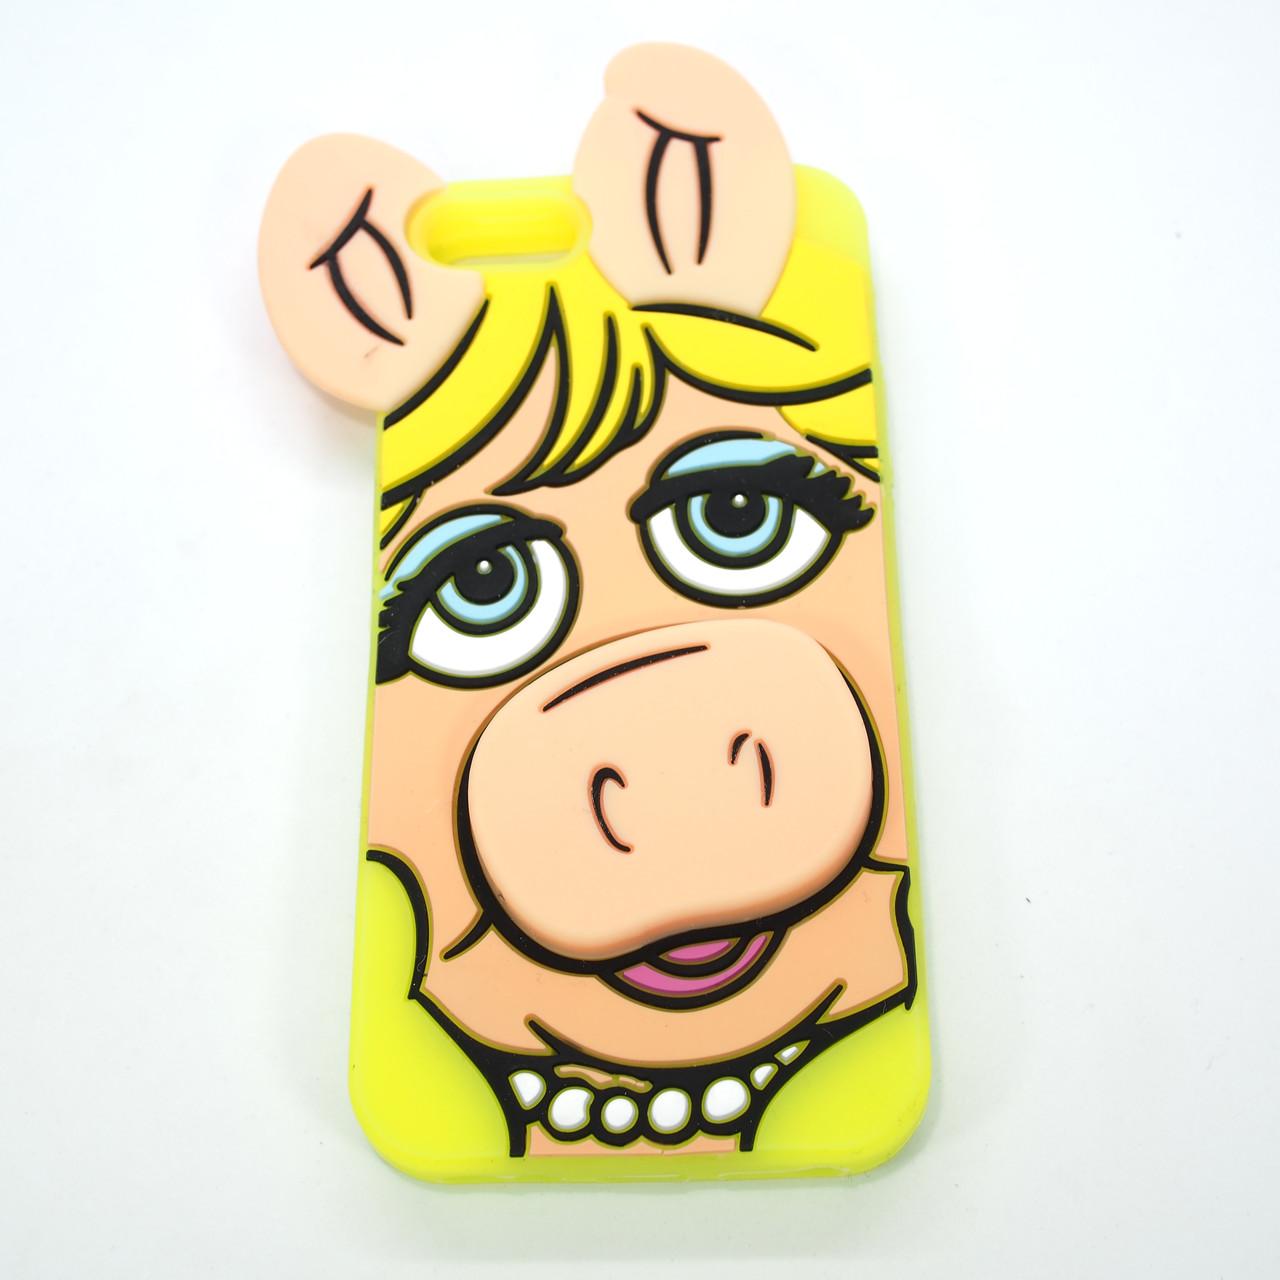 Silicon Moschino iPhone 5s SE Pig yellow Apple Для телефона Чехол